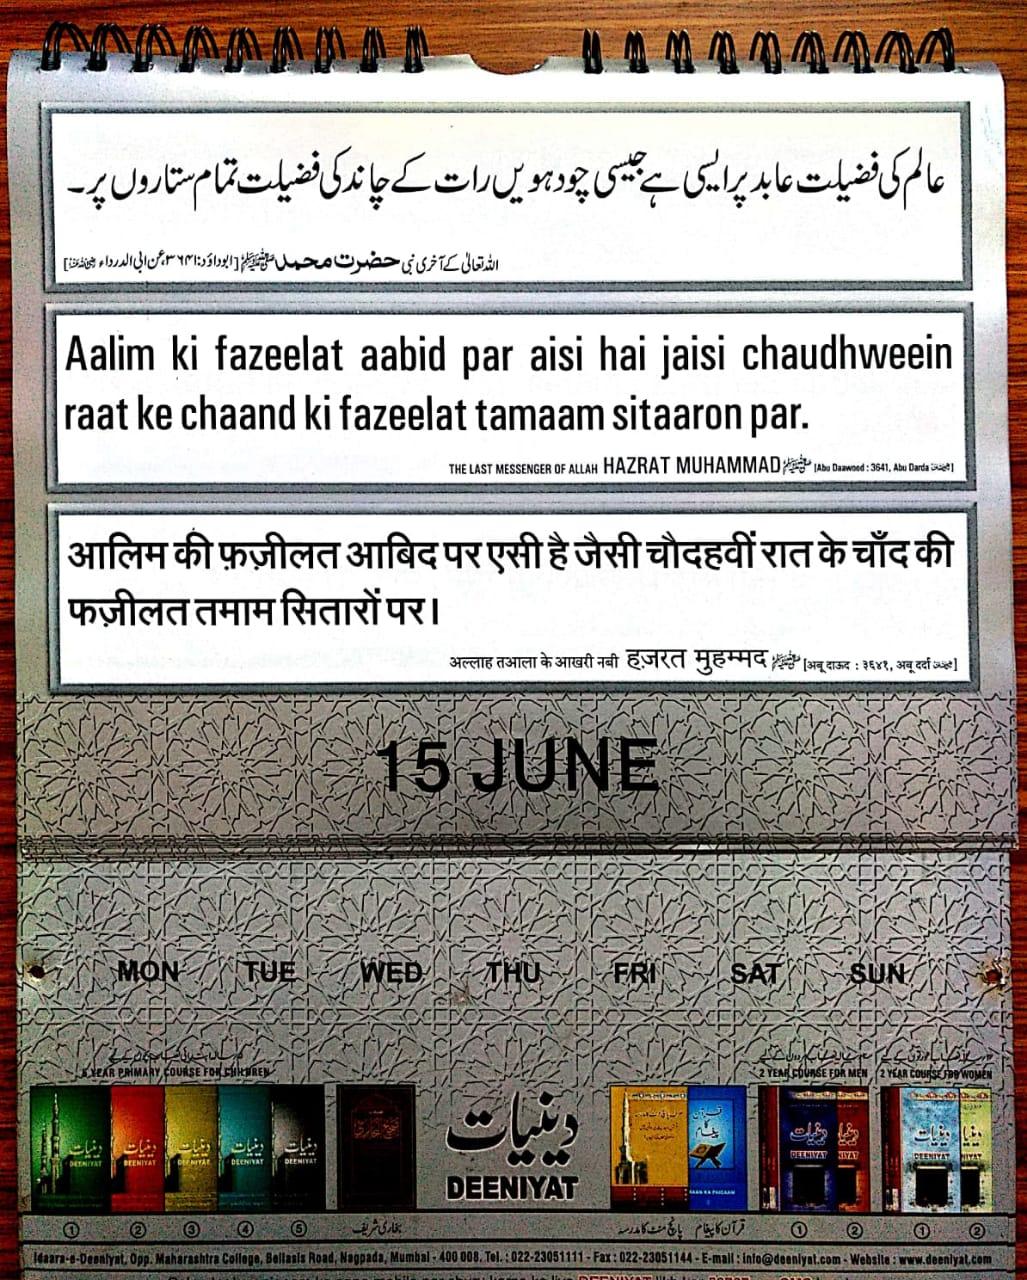 Daily Quran Hadees-11th Shawwaal 1440, Hijri 15th June 2019